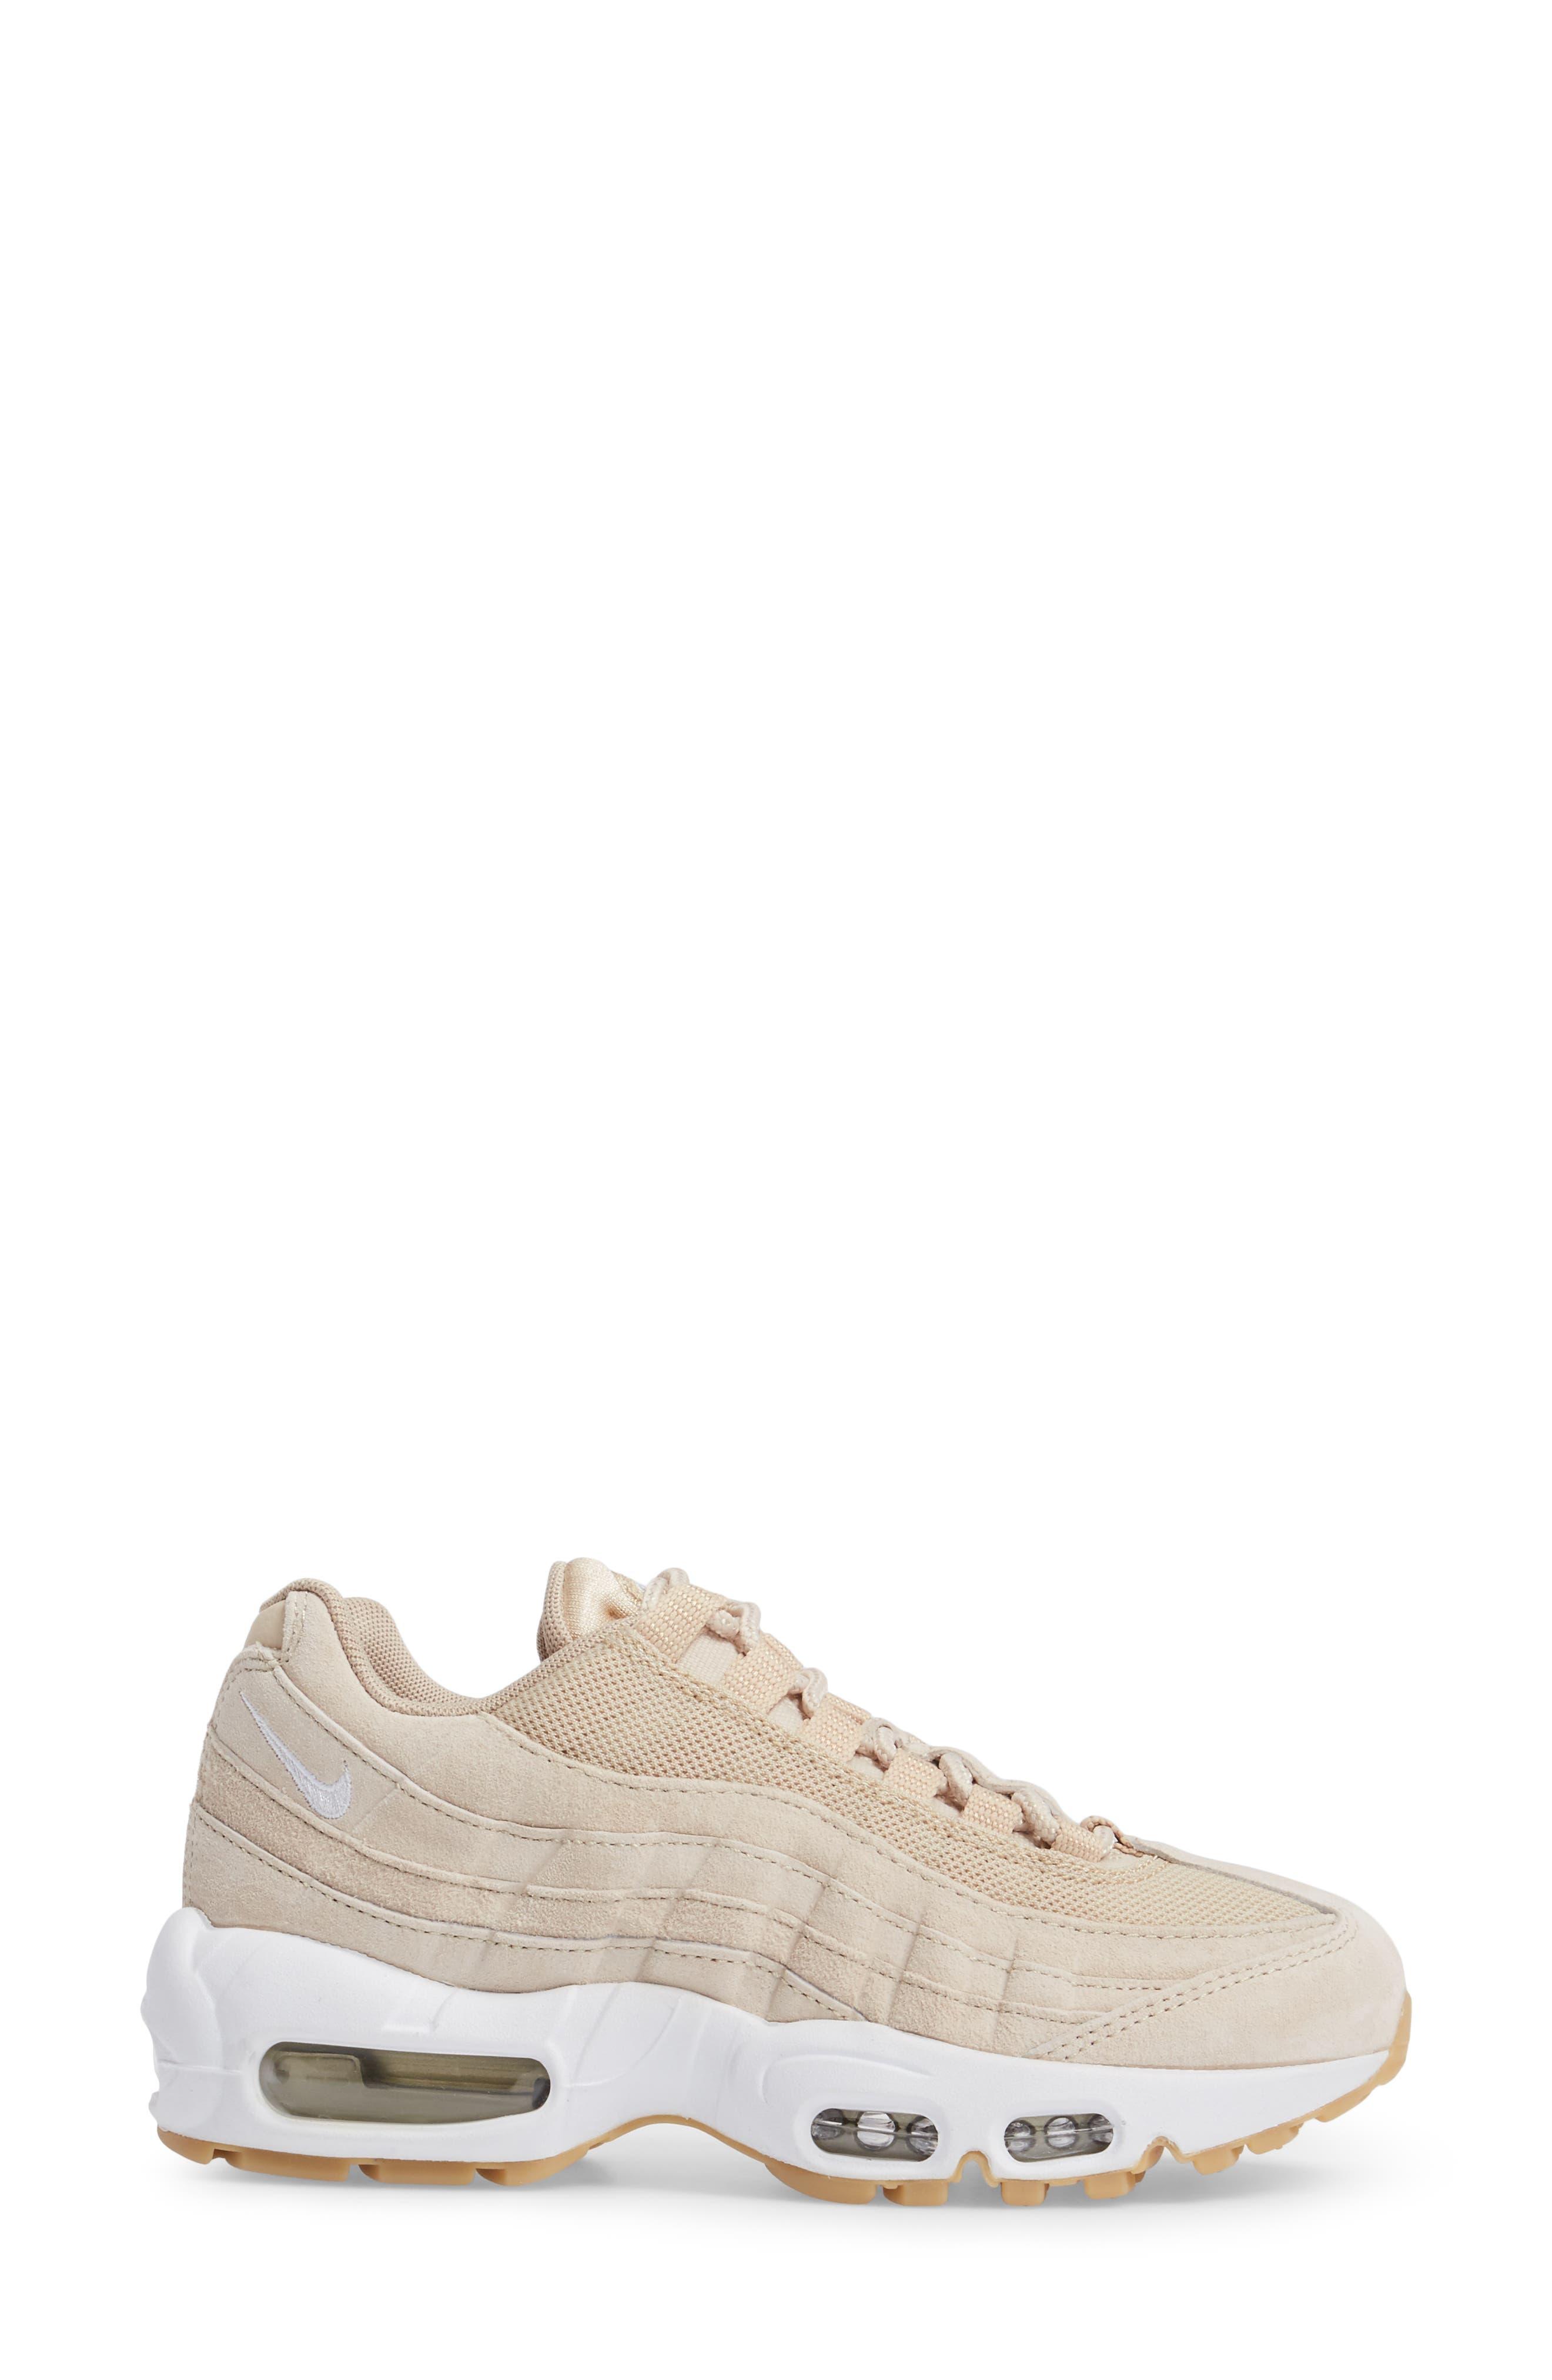 Air Max 95 SD Sneaker,                             Alternate thumbnail 3, color,                             Oatmeal/ White